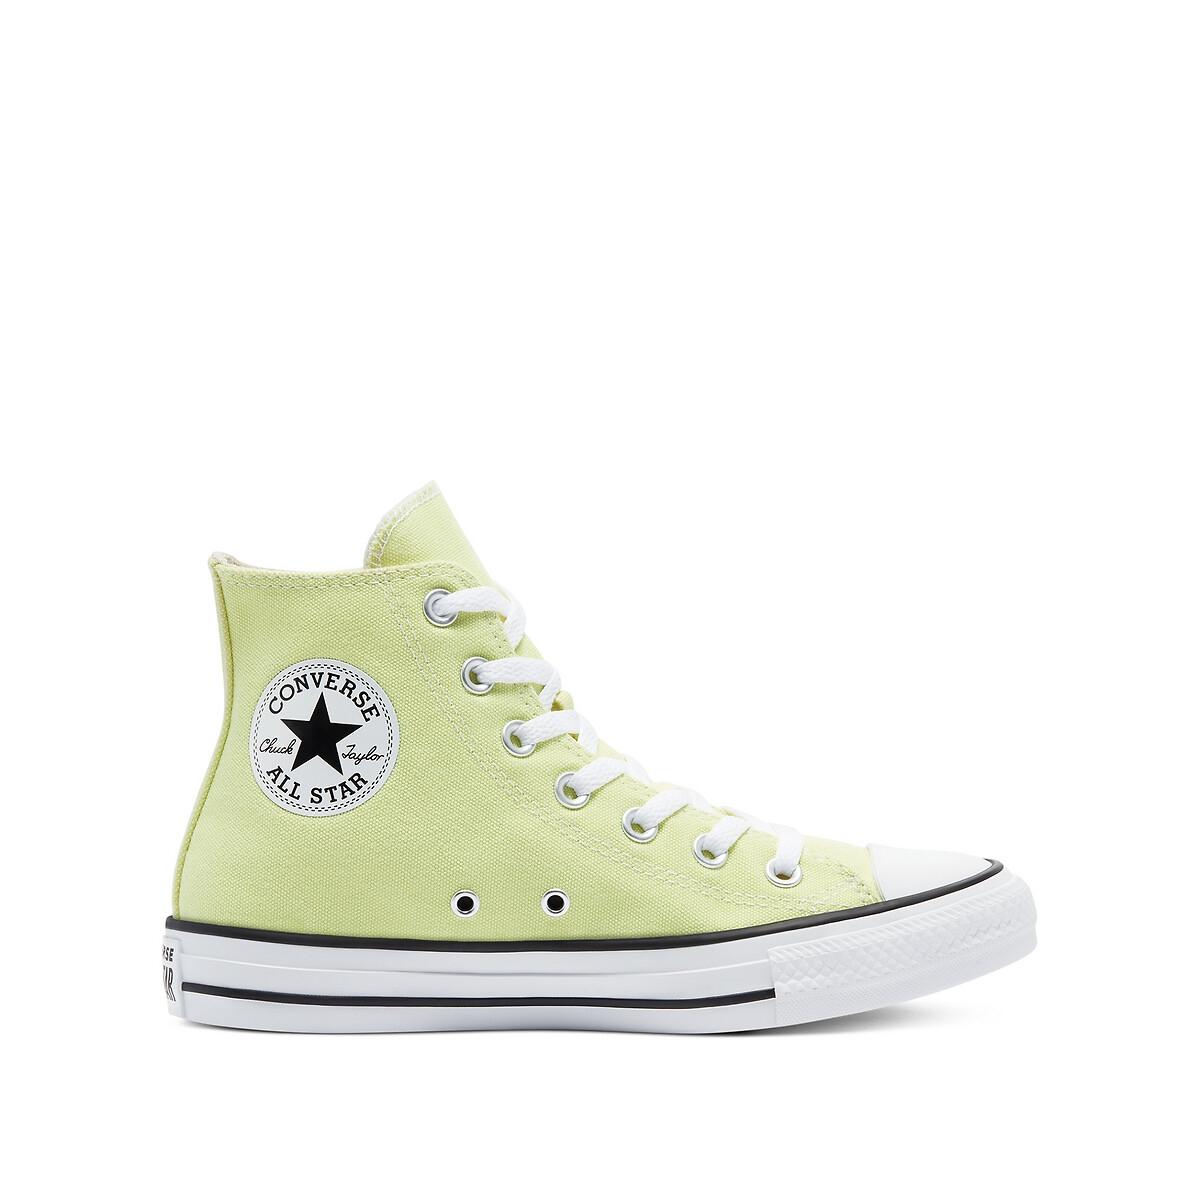 Converse Sneakers Chuck Taylor All Star Seasonal Color online kopen